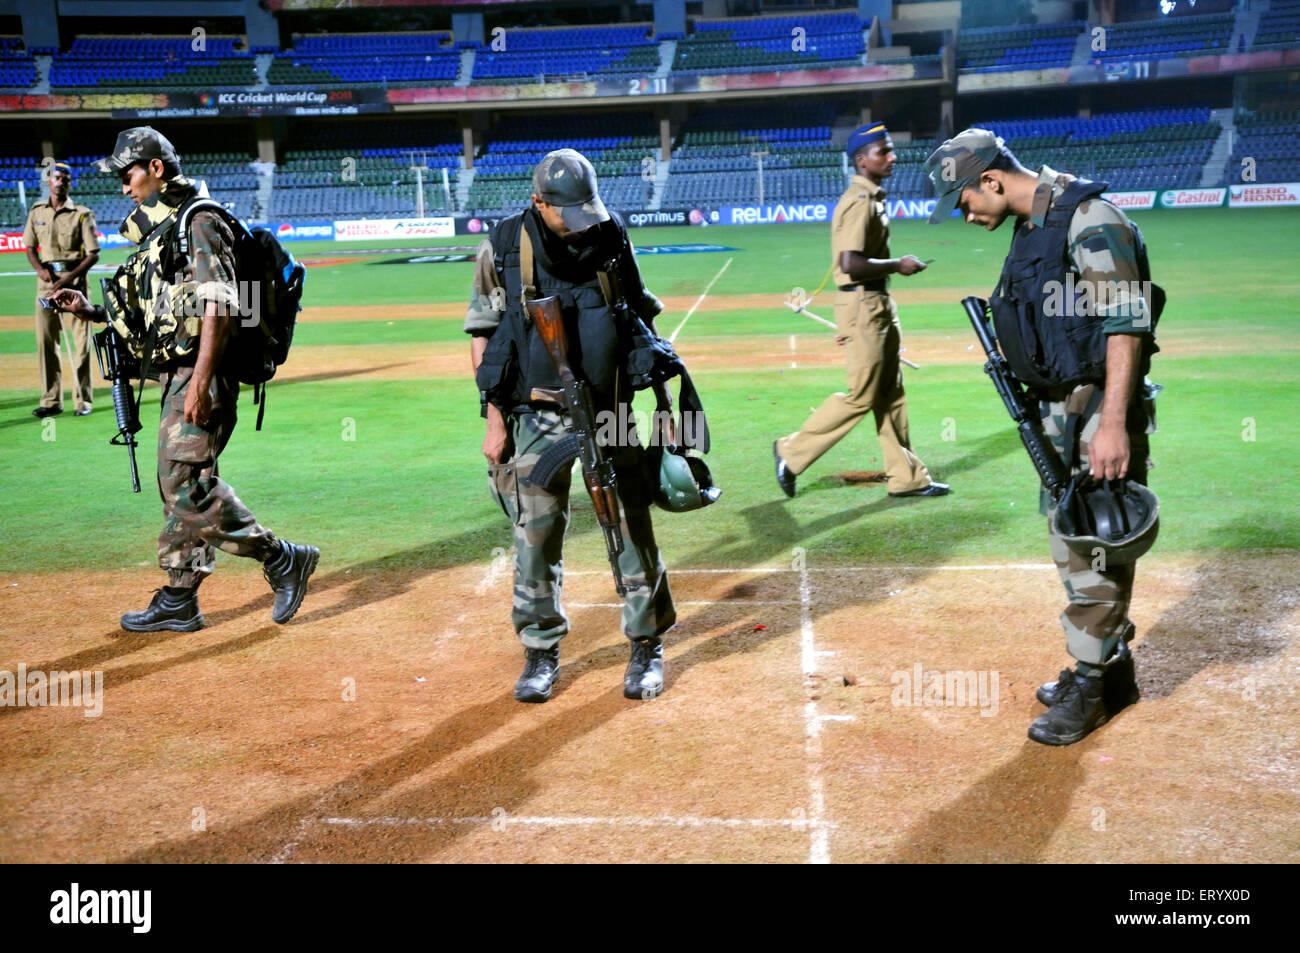 Quick Response Team commandos Mumbai Police cricket pitch Wankhede stadium ICC Cricket World Cup 2011 - Stock Image